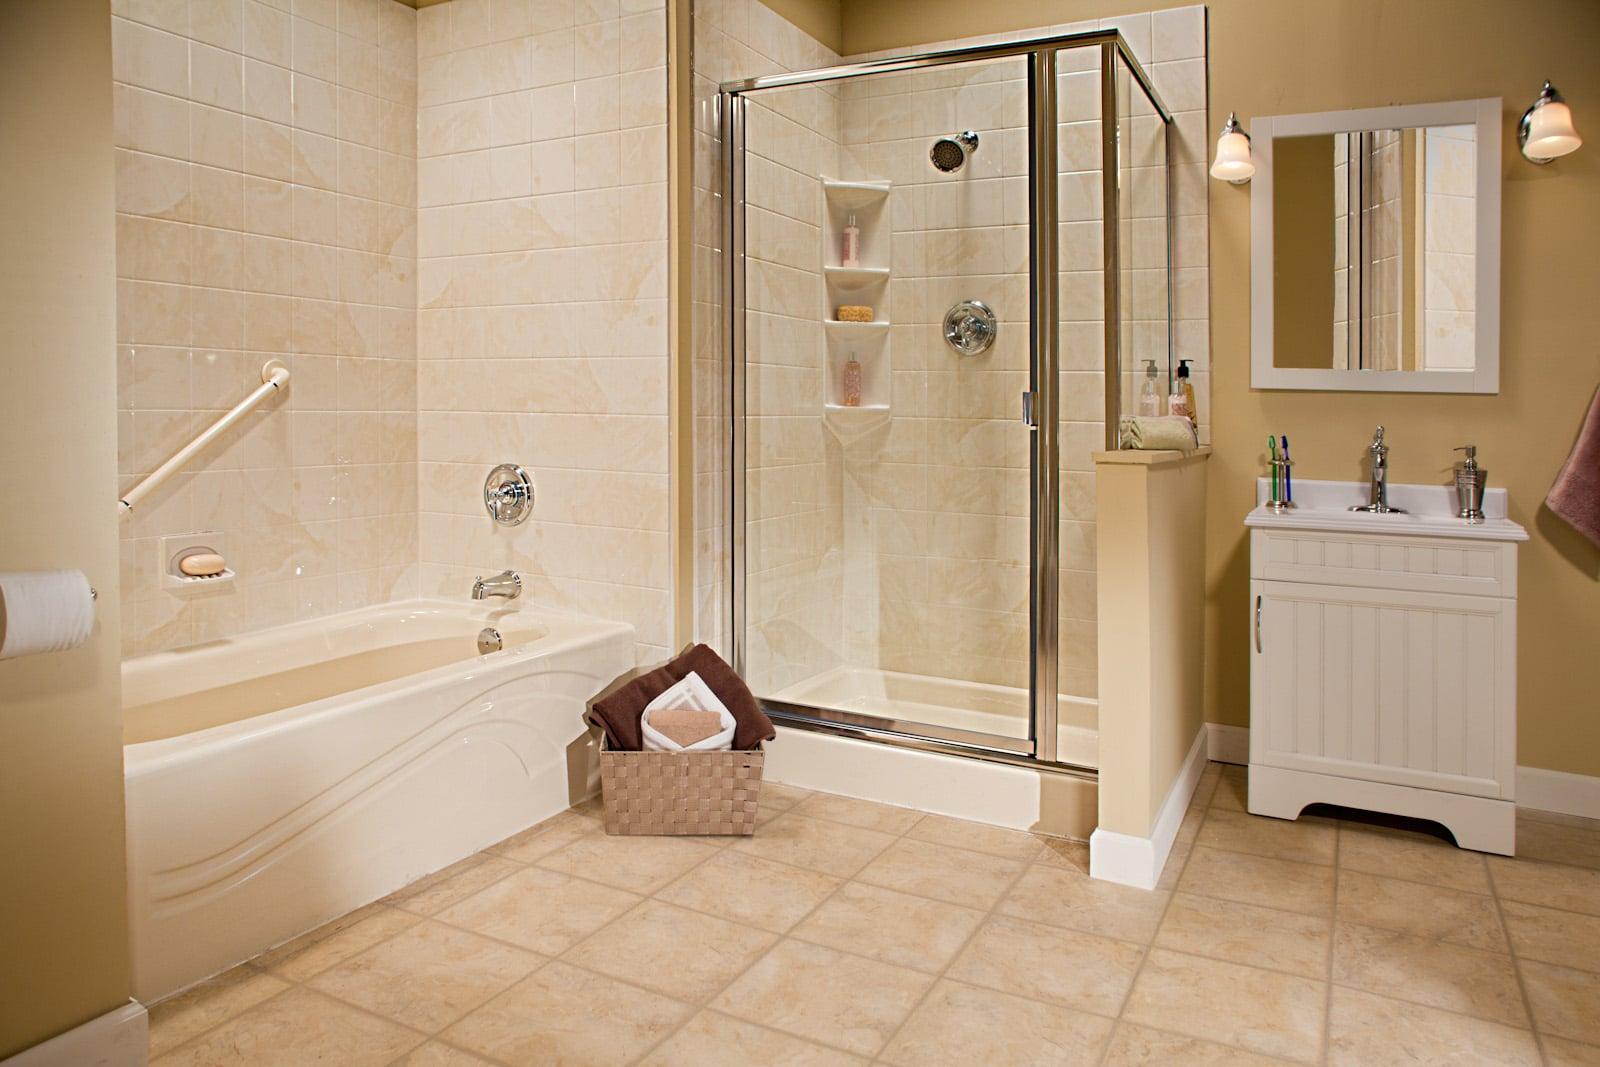 South Florida Bath & Shower Remodel - Bathrooms Plus Inc (4)